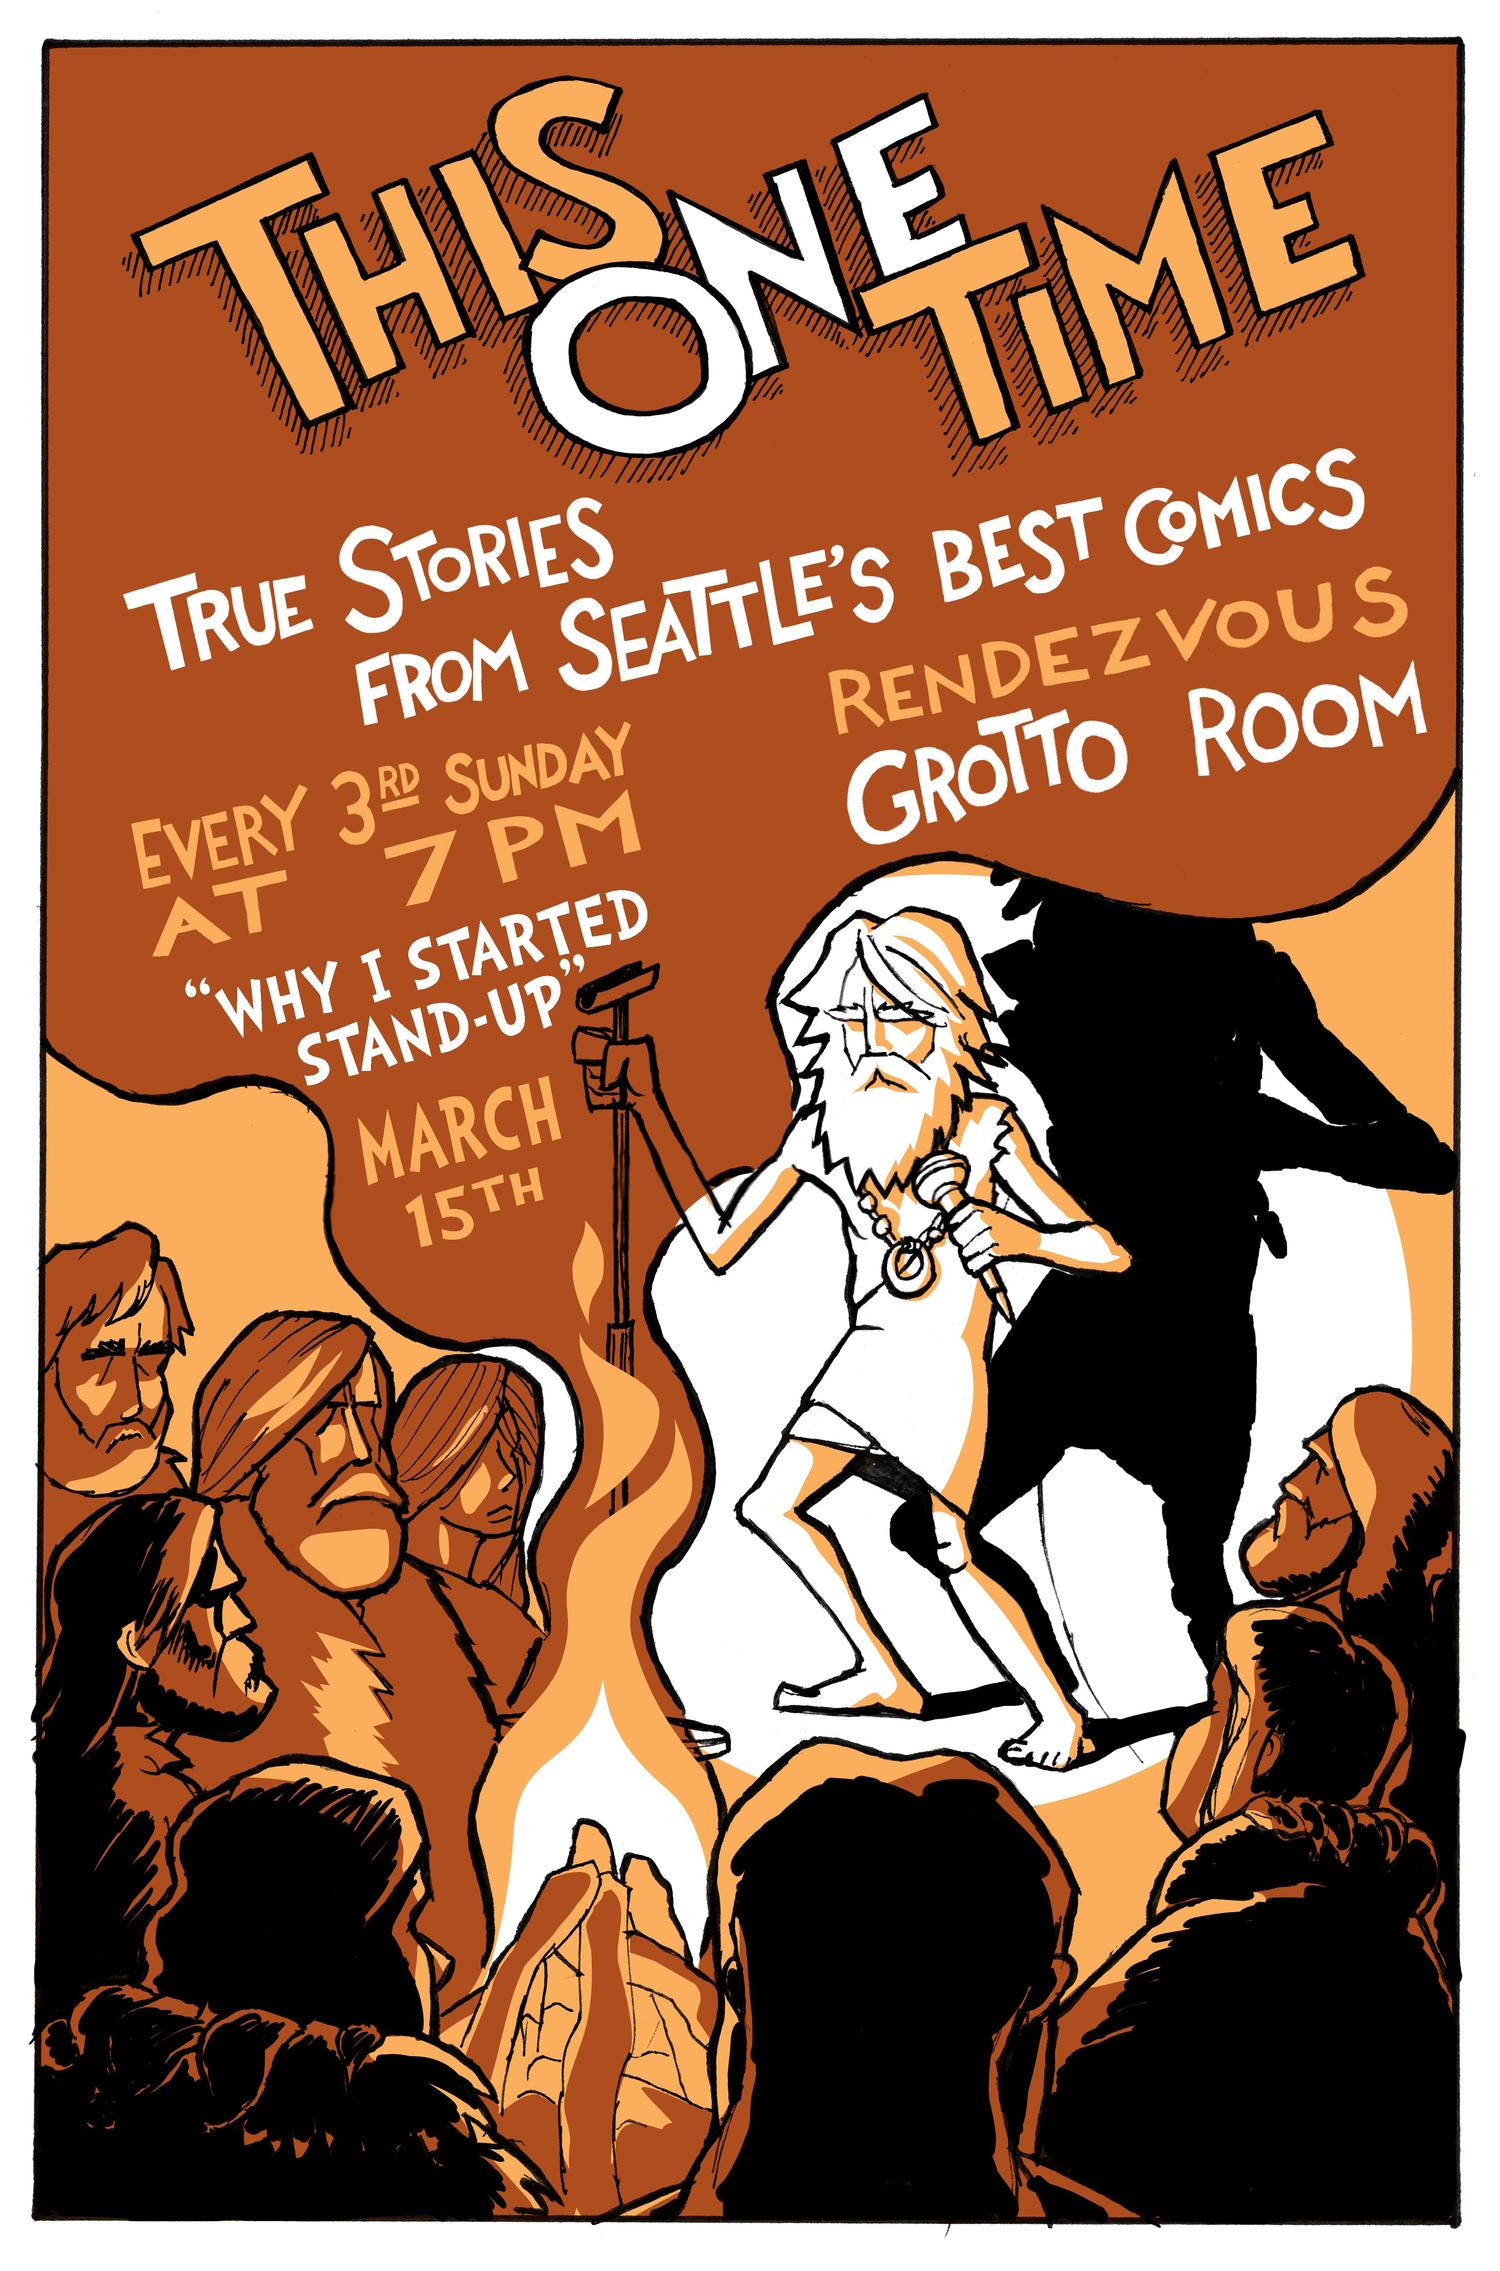 The Storytelling Show - Paul Barach